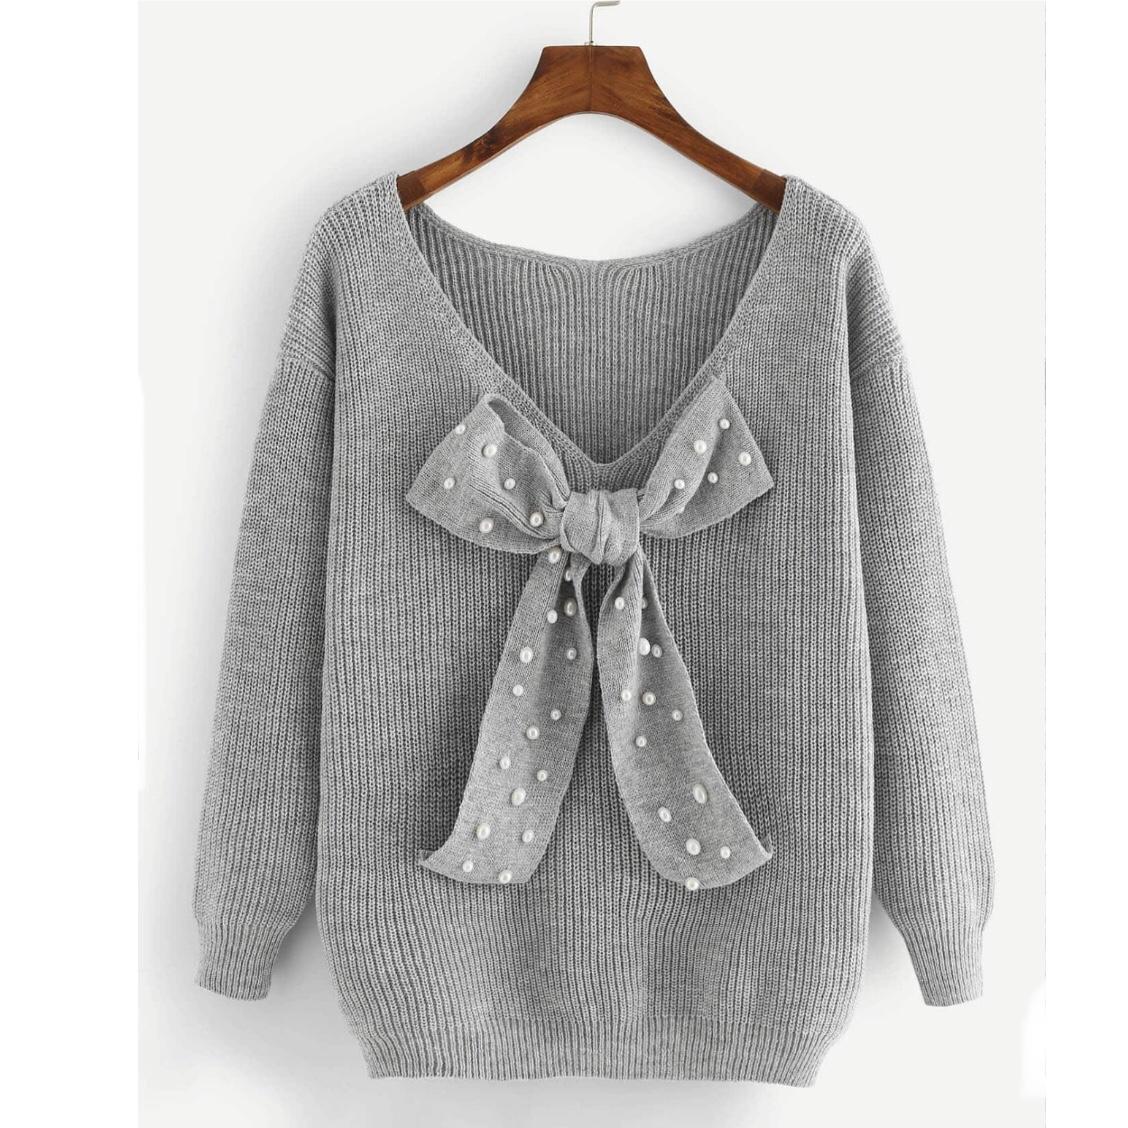 Shein Bow Sweater